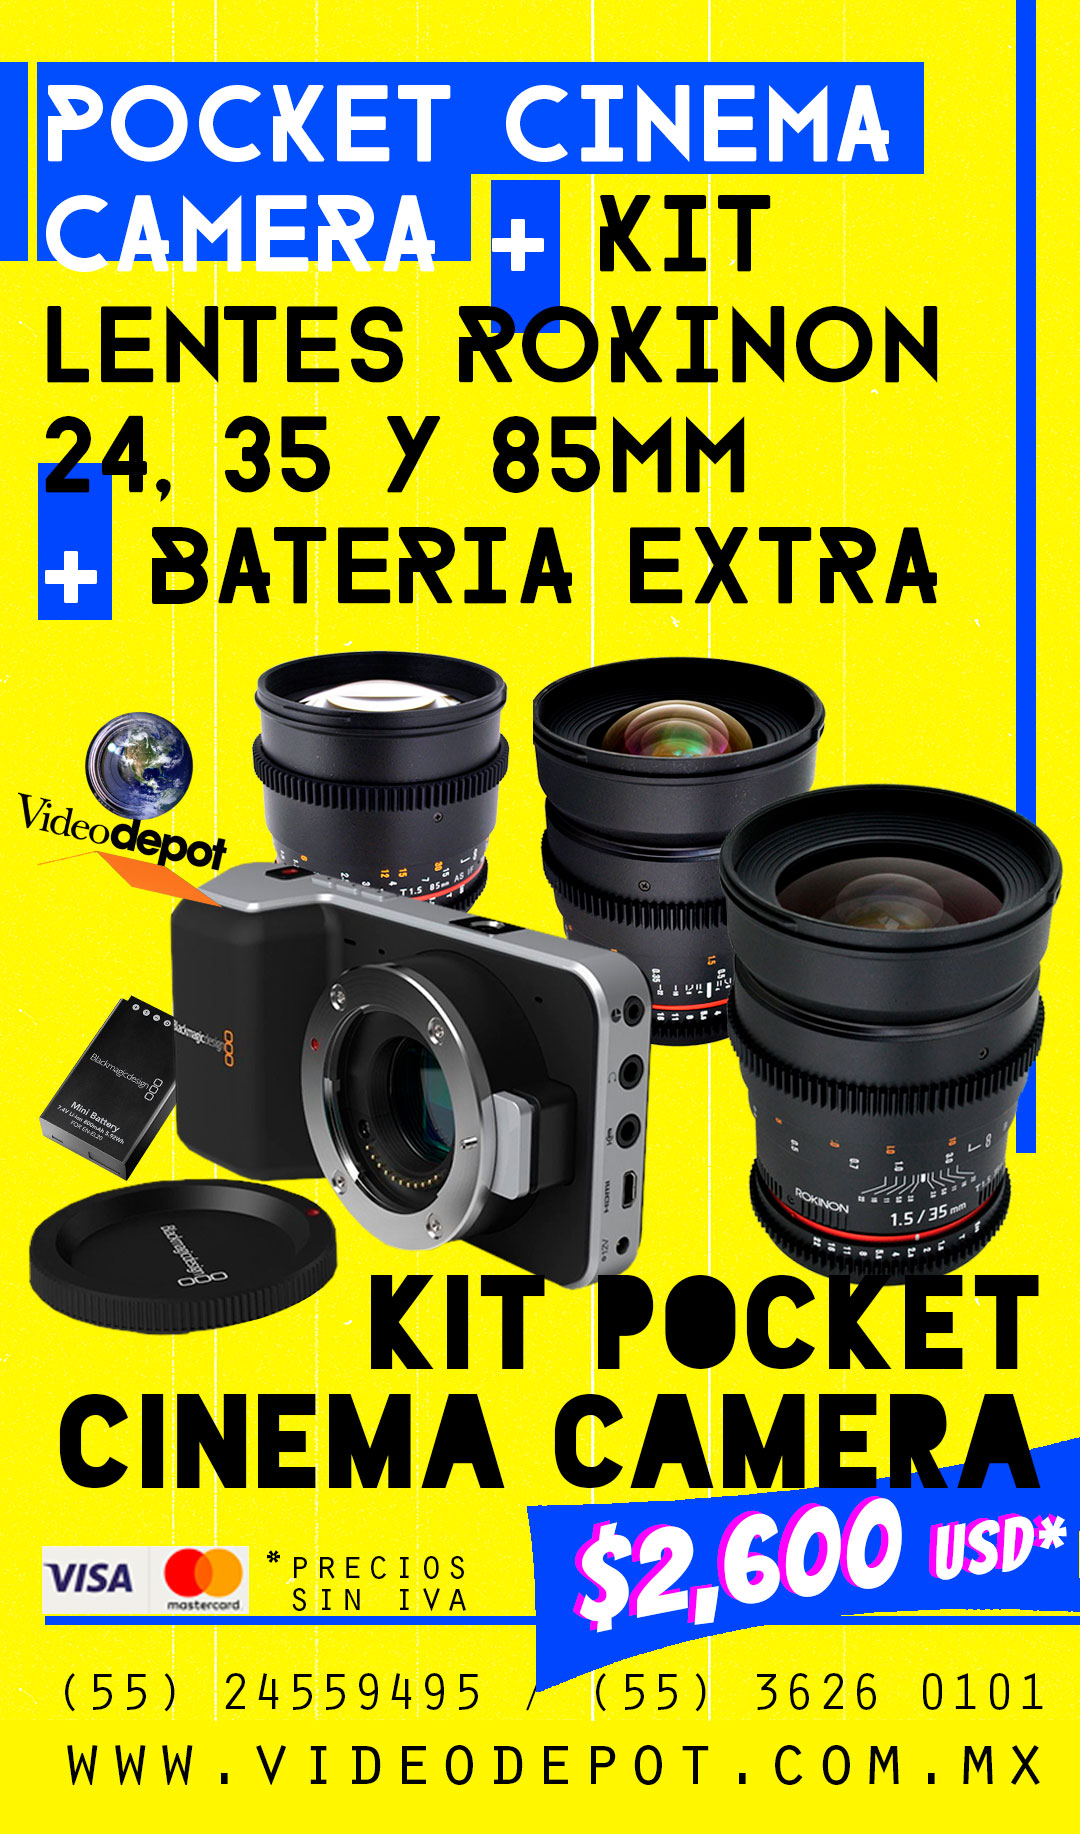 kit-pocket-cinema